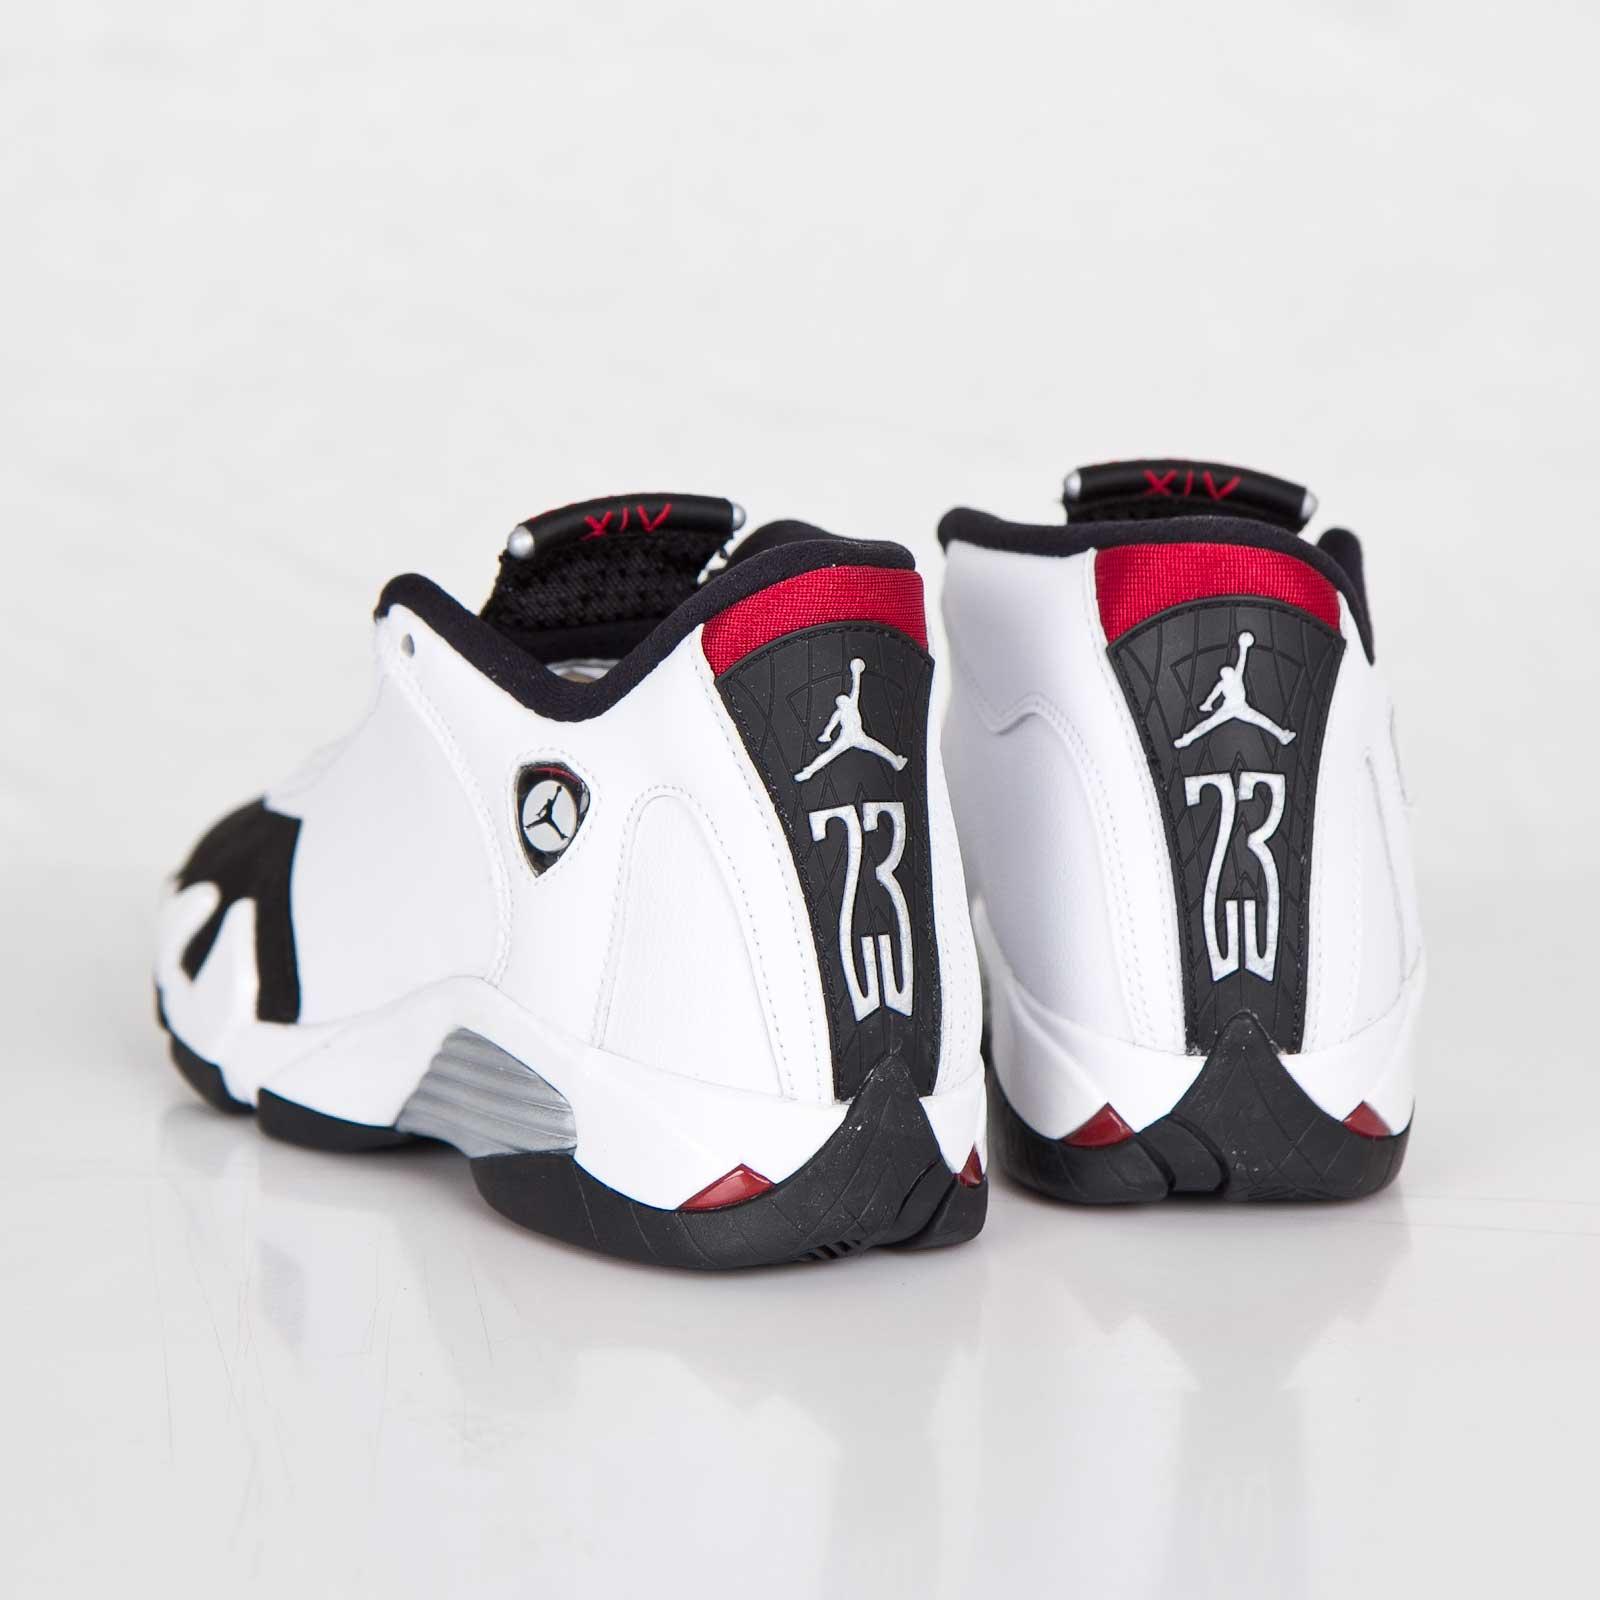 new product d9ca8 61f1e Jordan Brand Air Jordan 14 Retro (GS) - 654963-102 - Sneakersnstuff    sneakers   streetwear online since 1999